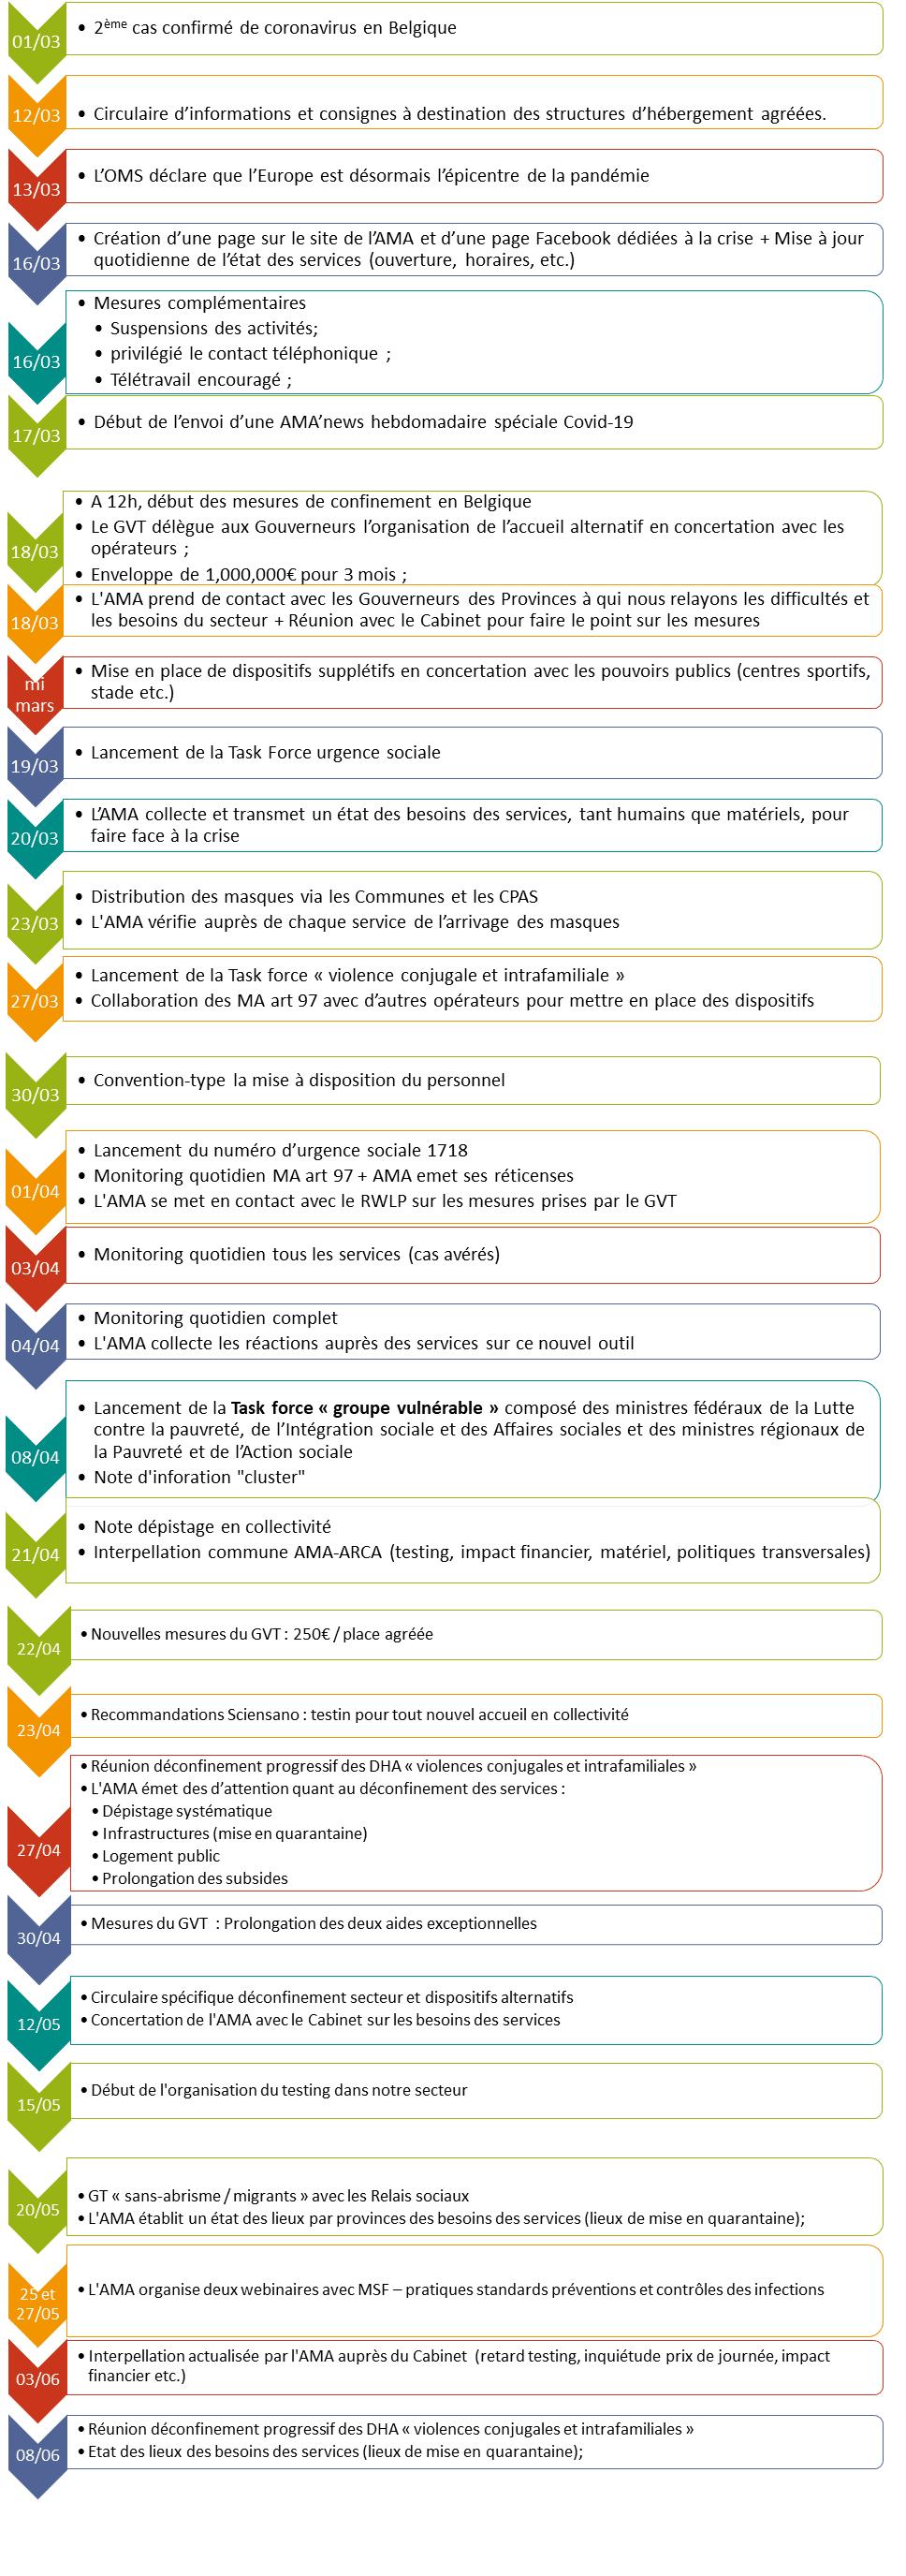 Chronologie de la crise RW